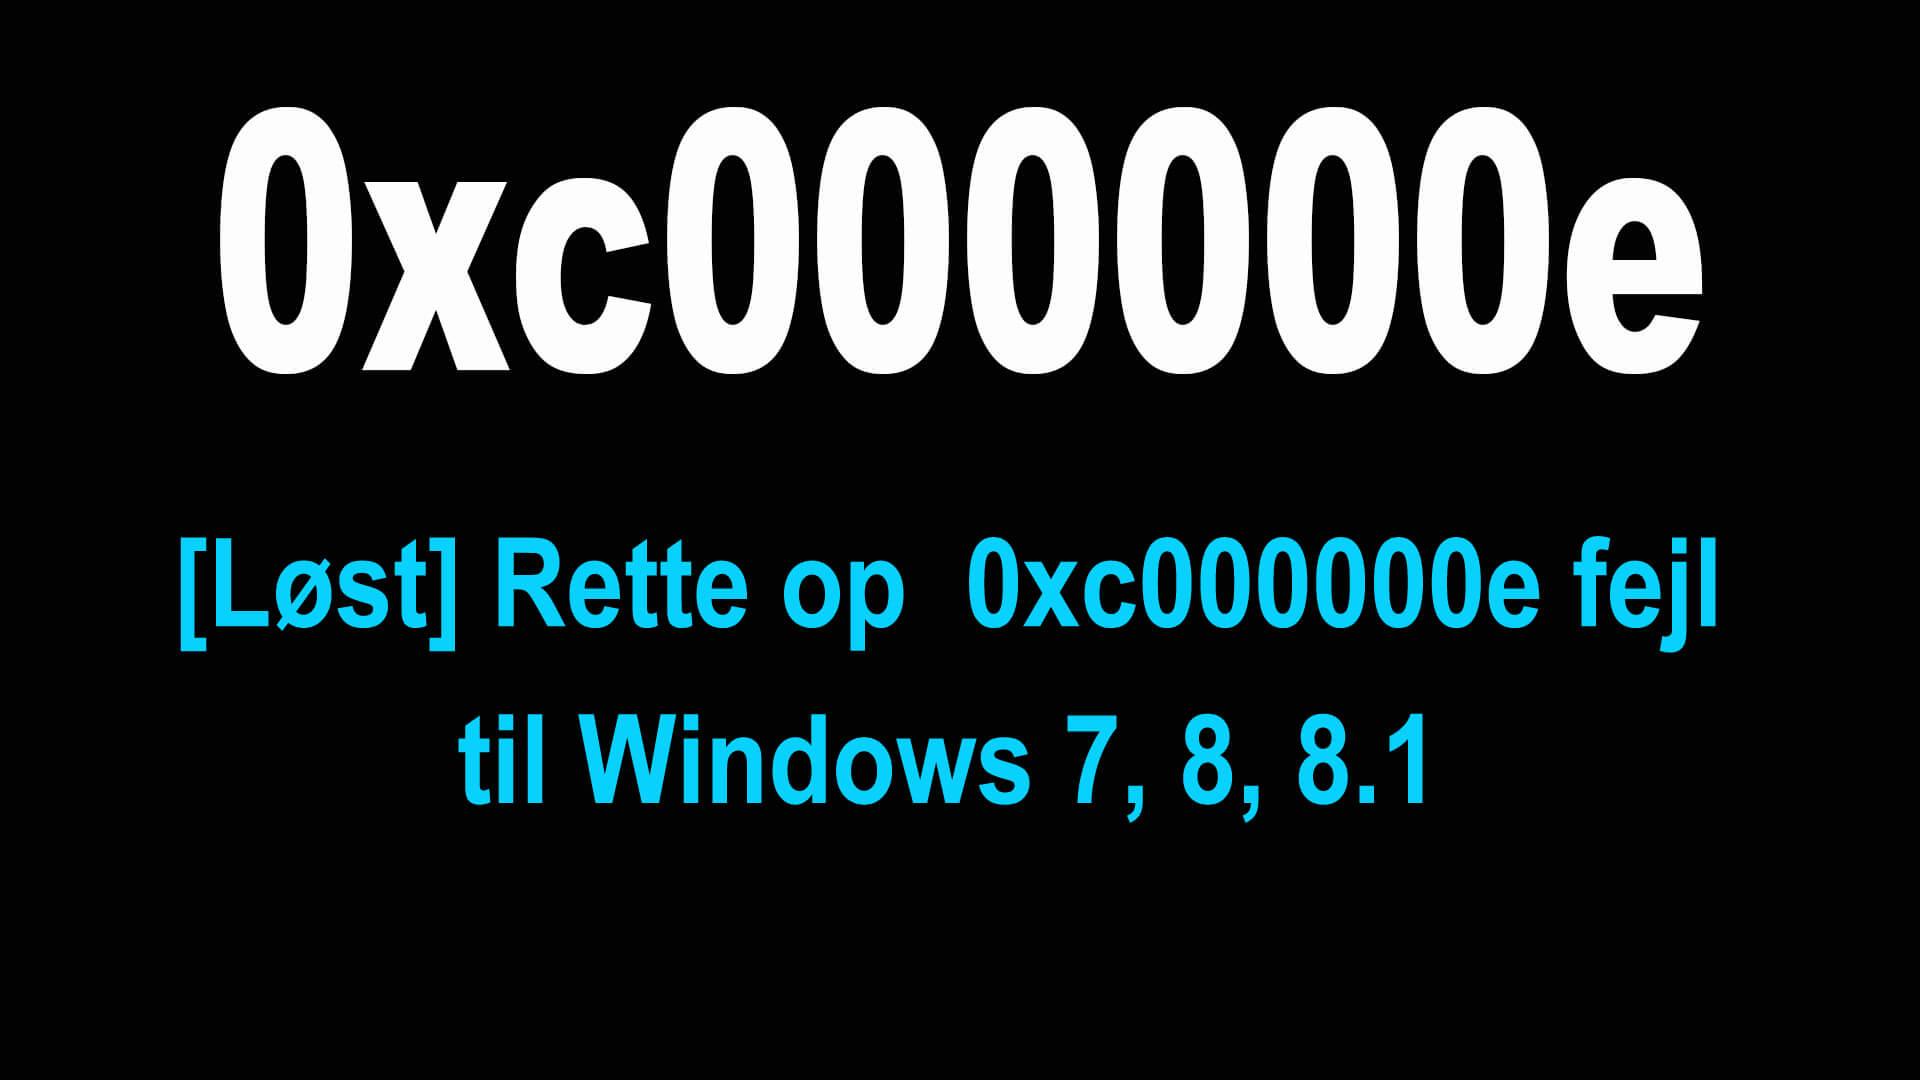 genopbygge BCD'en for at rette 0xc000000e-fejlen